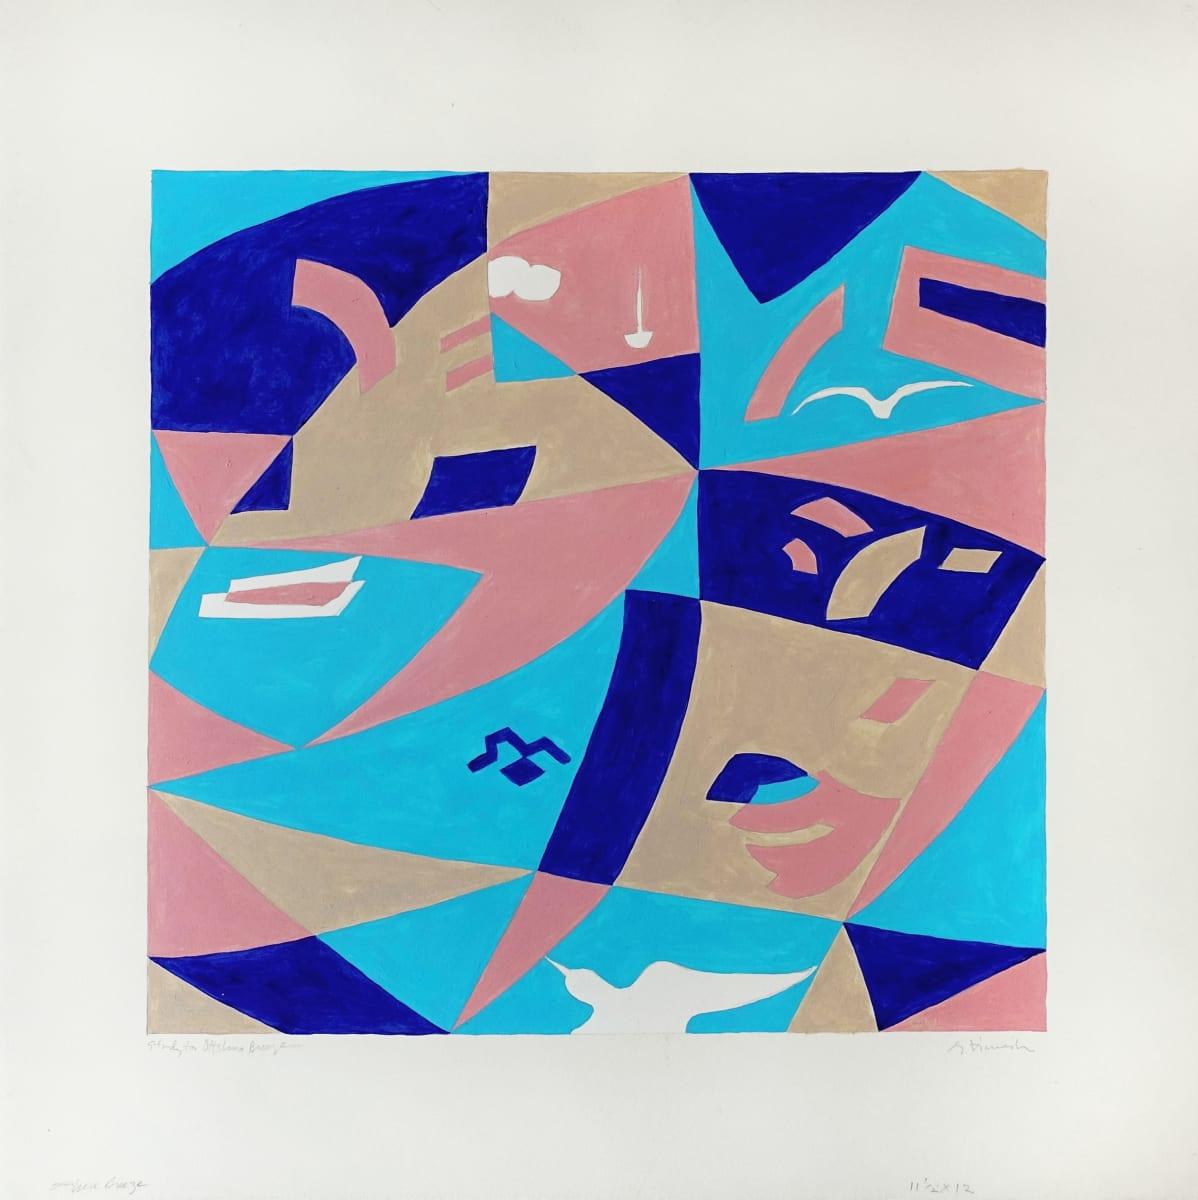 George Vranesh: Kaleidoscopic Modernism